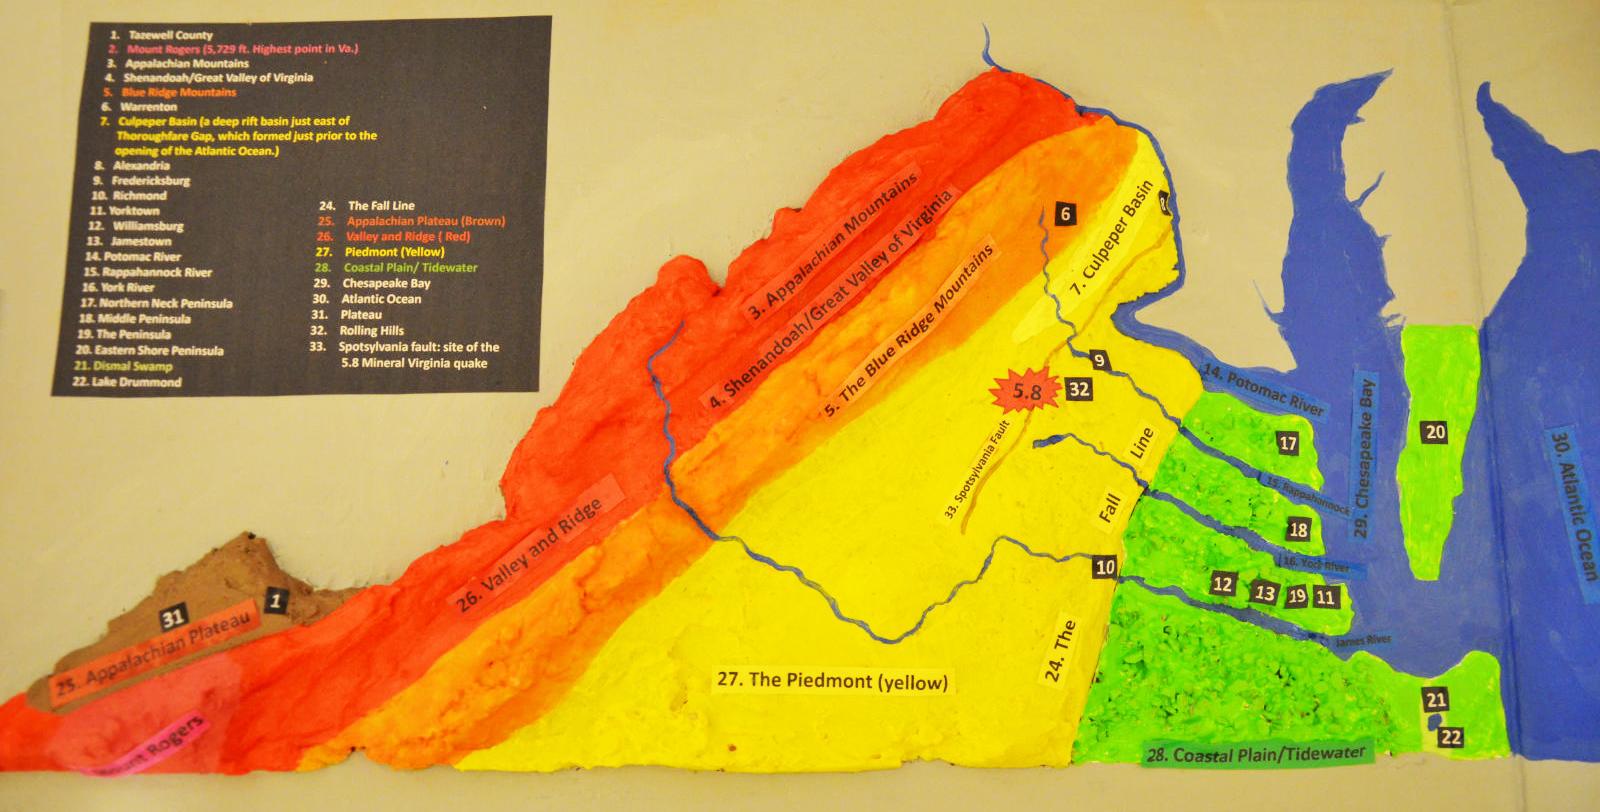 Salt Dough Physiographic Province Map Of Virginia